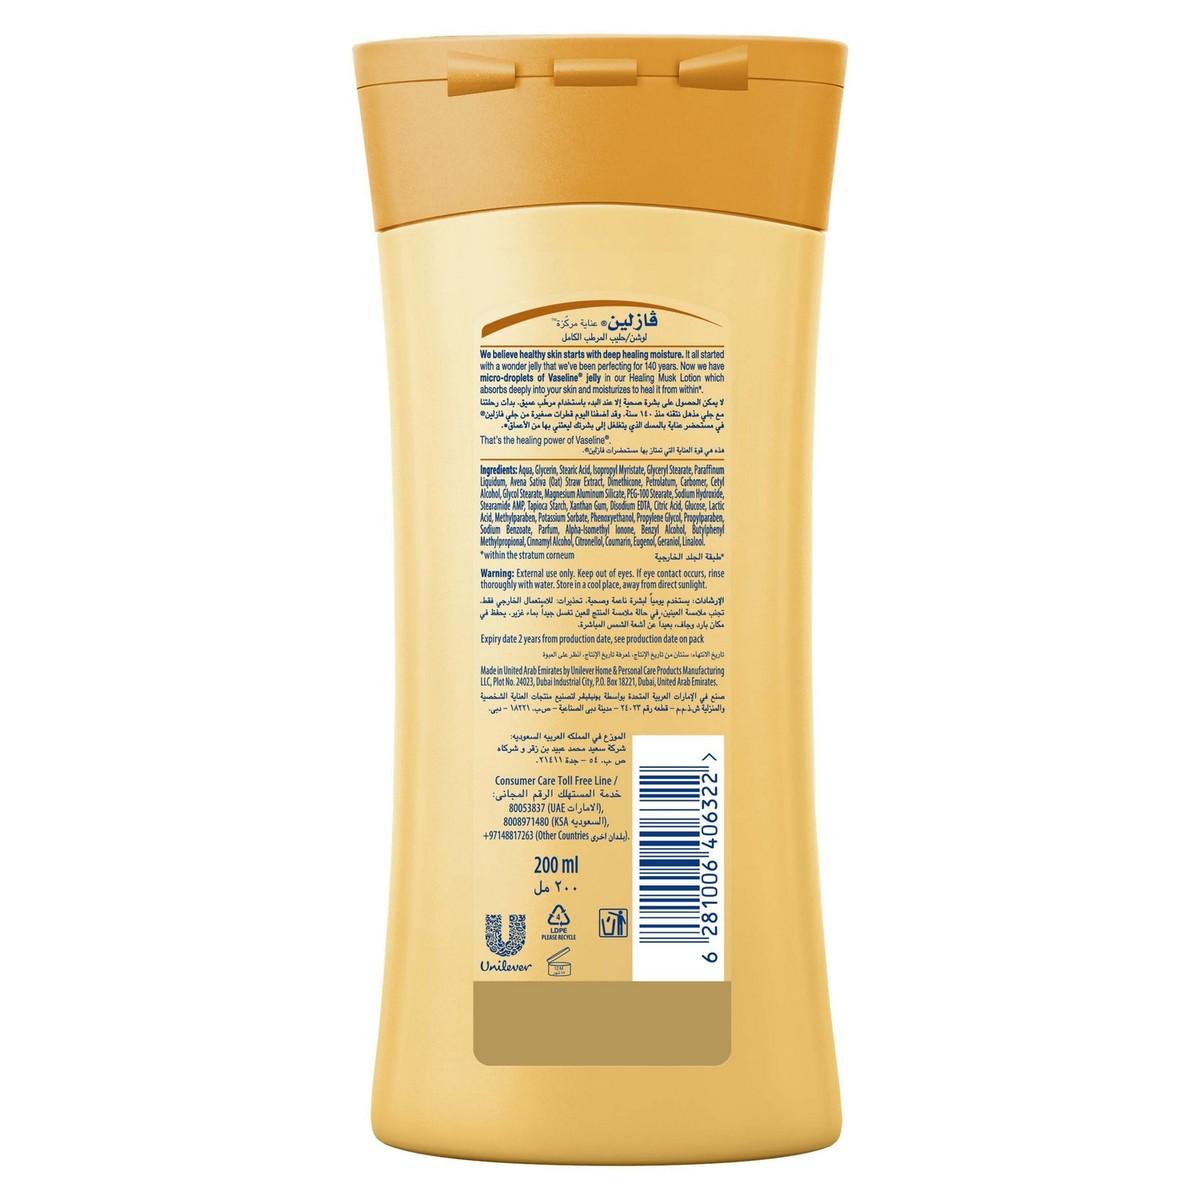 Buy Vaseline Body Lotion Healing Musk 200ml - Body Lotion